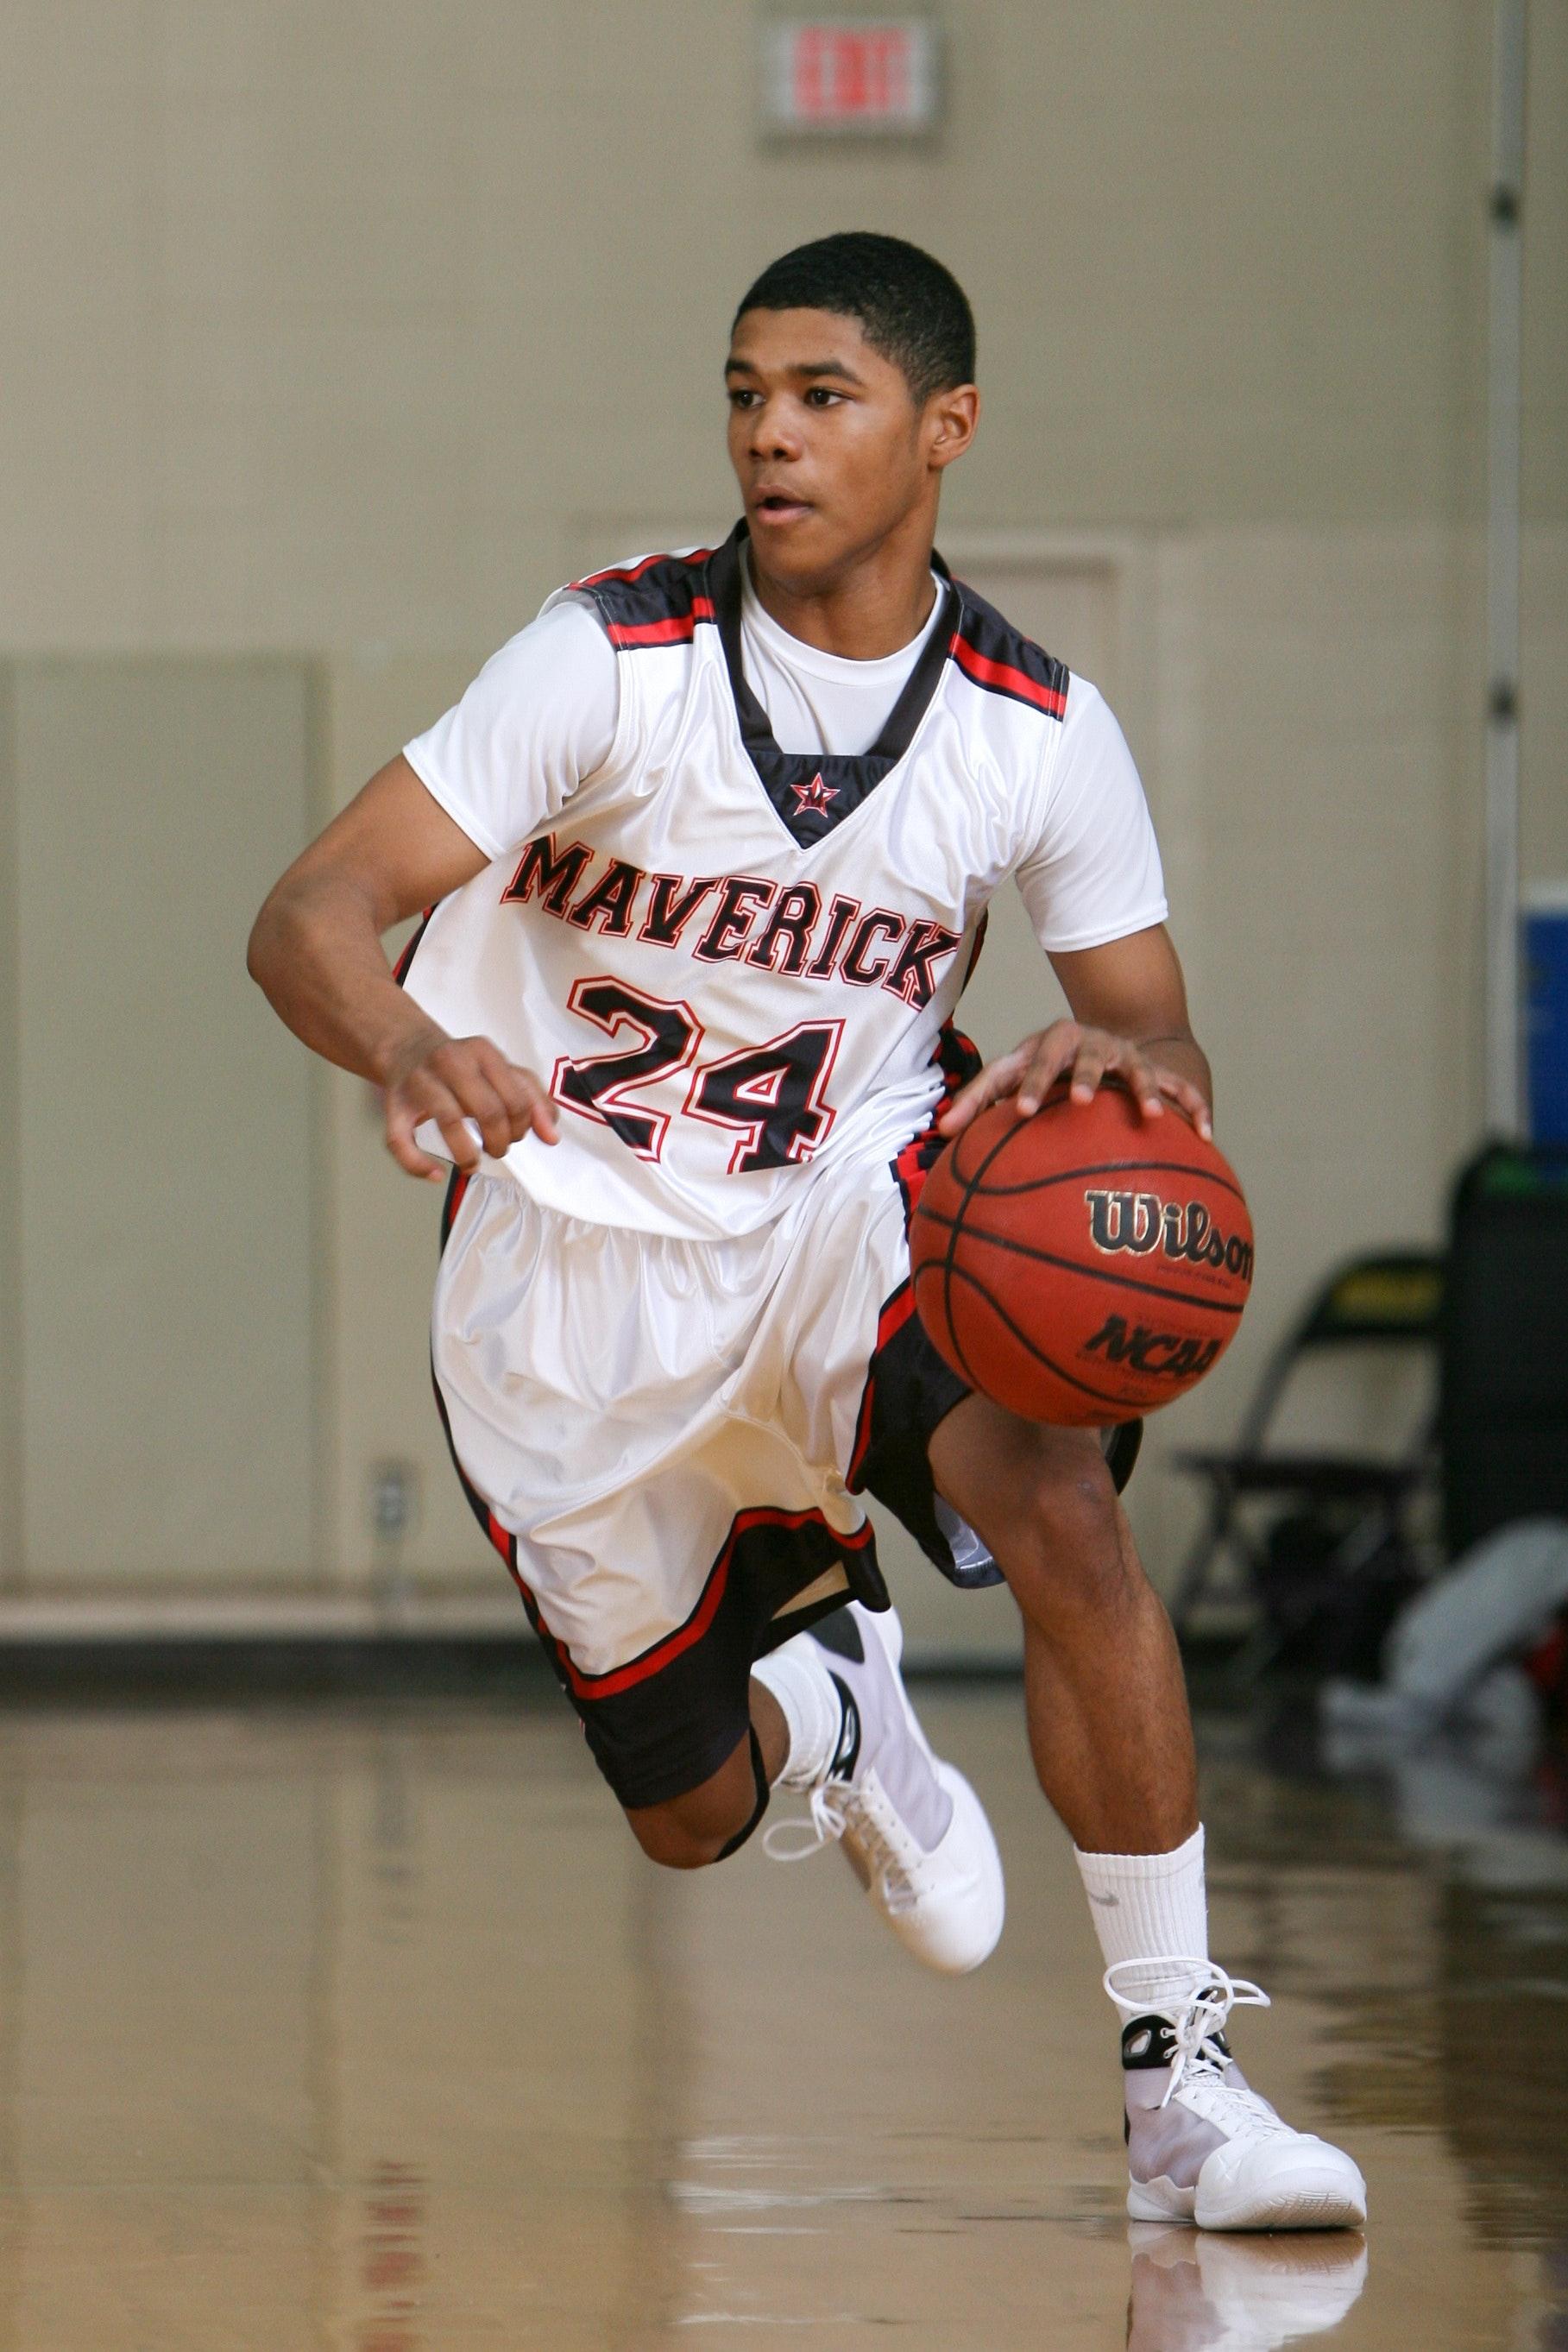 Man Playing Basketballwilson, Athlete, Athletic, Ball, Basketball, HQ Photo